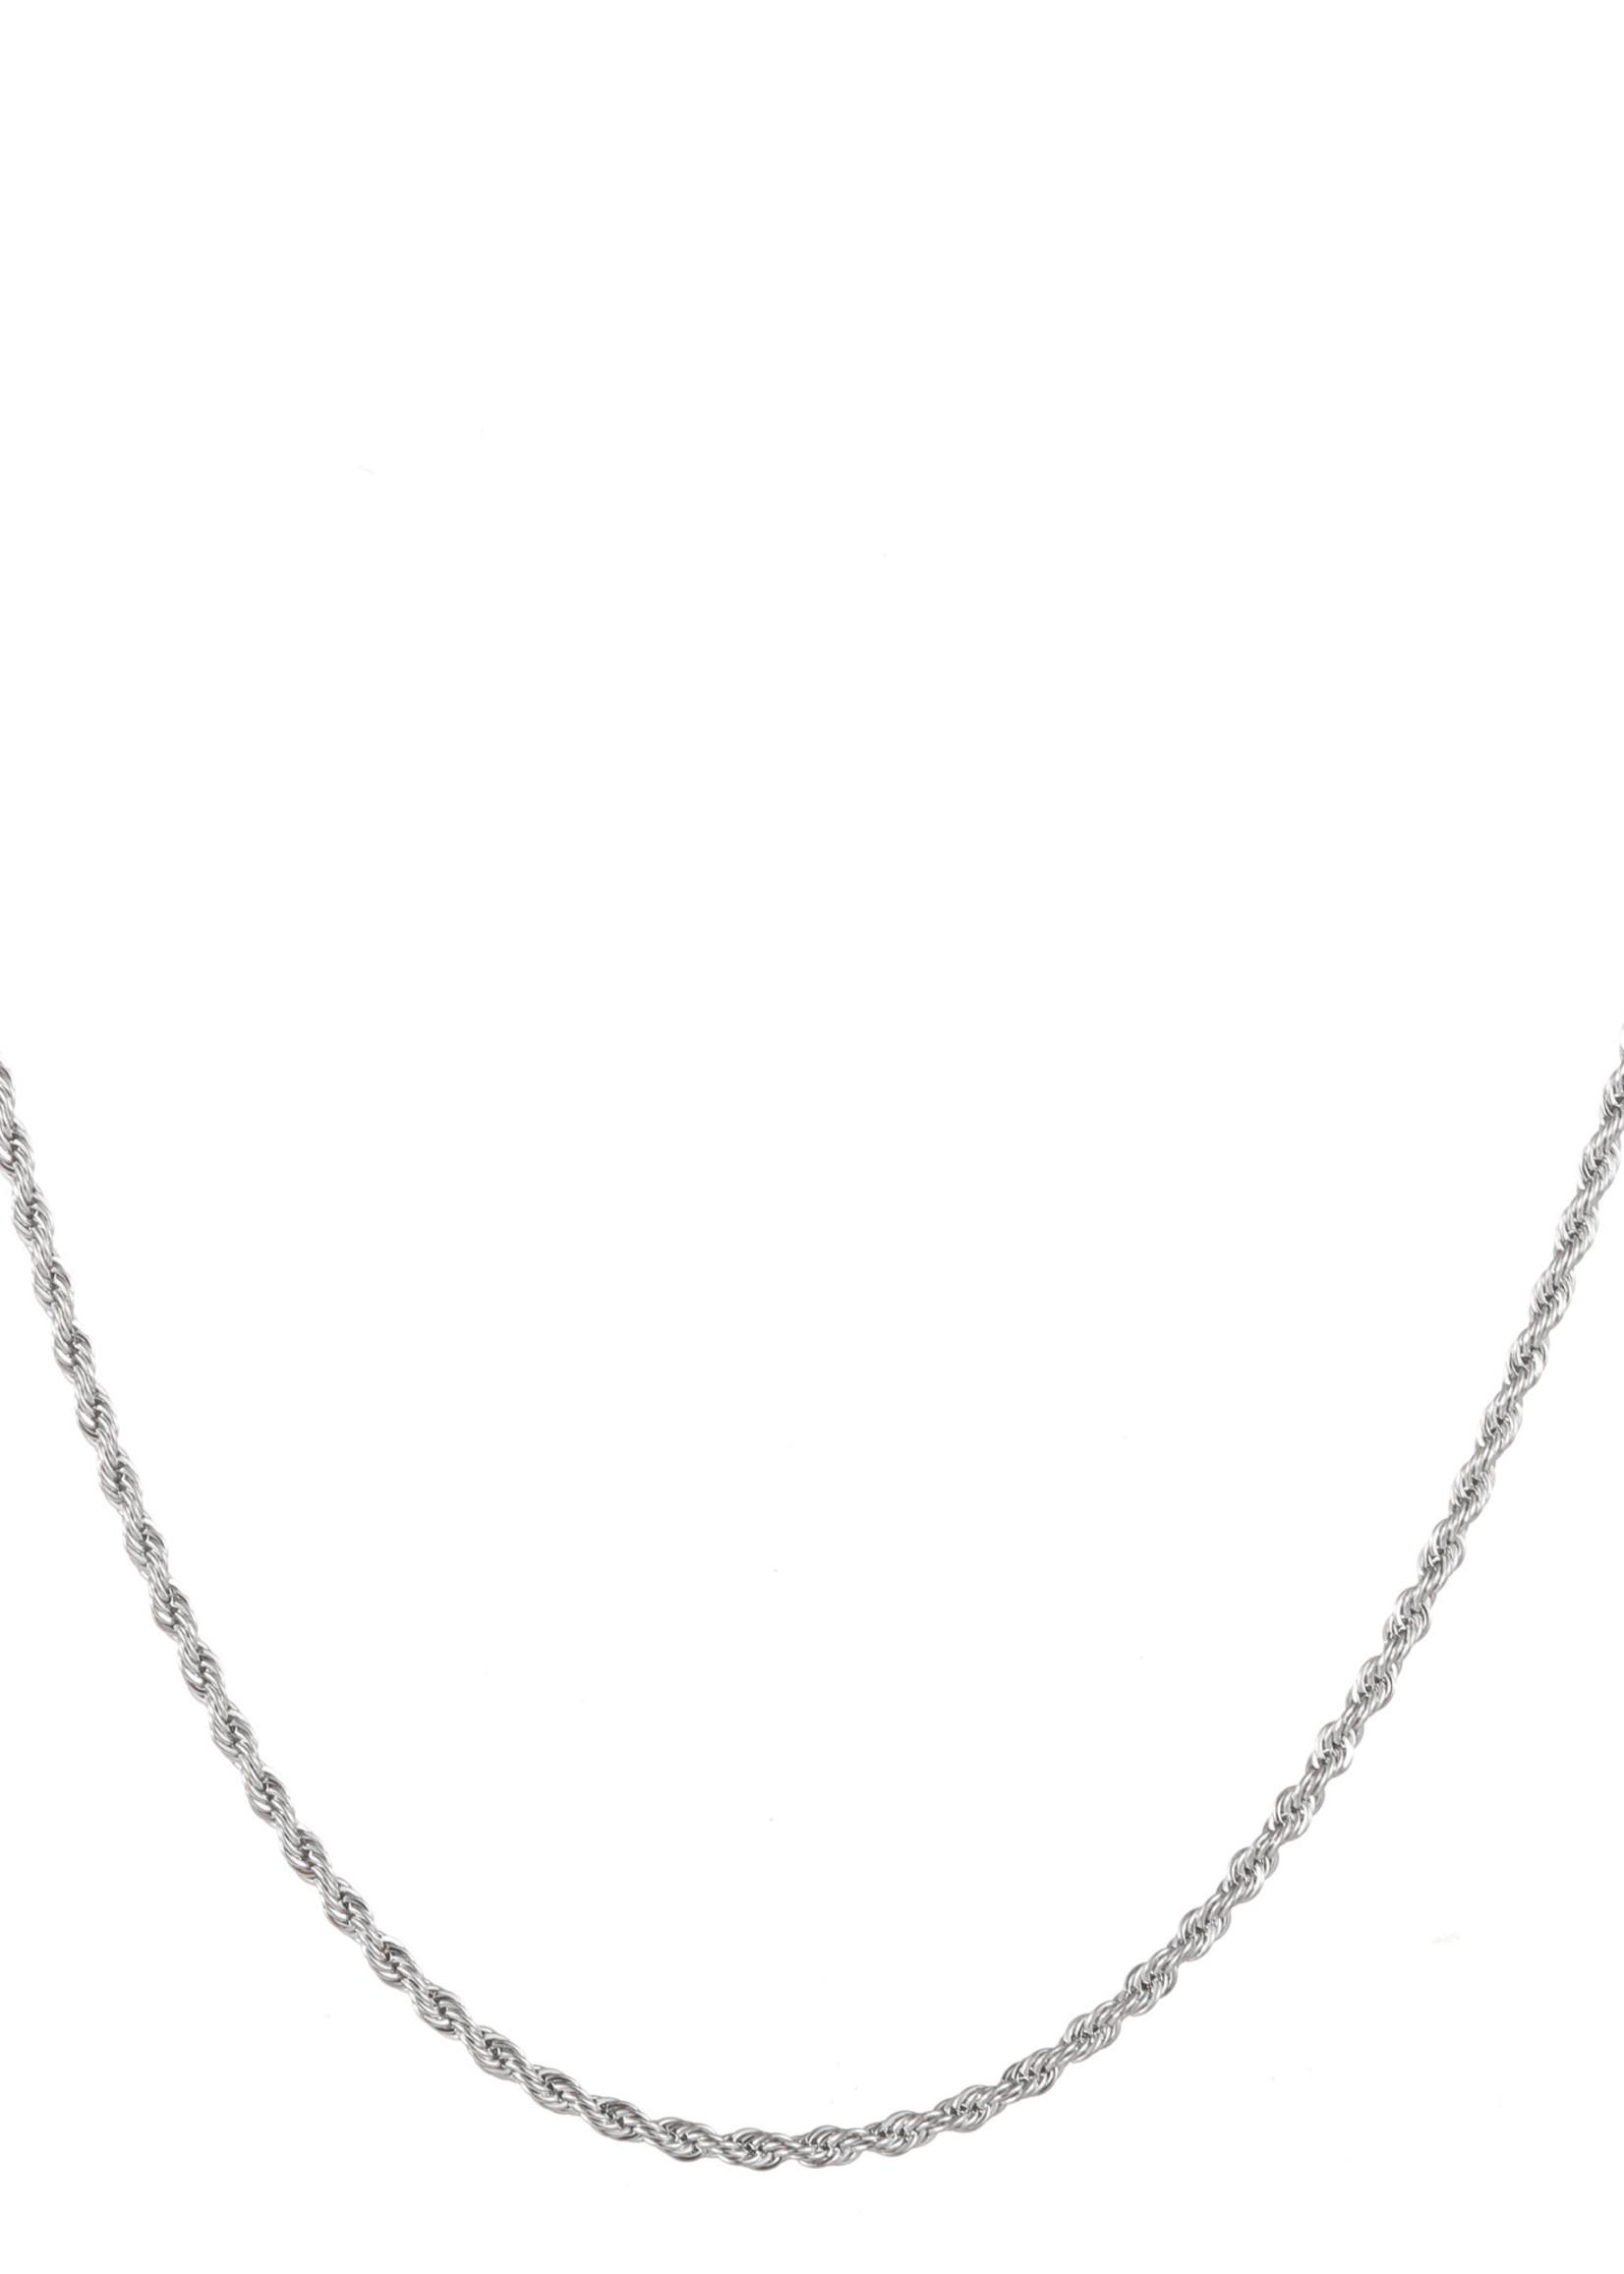 Ketting zilver fijn gedraaid N1771-1